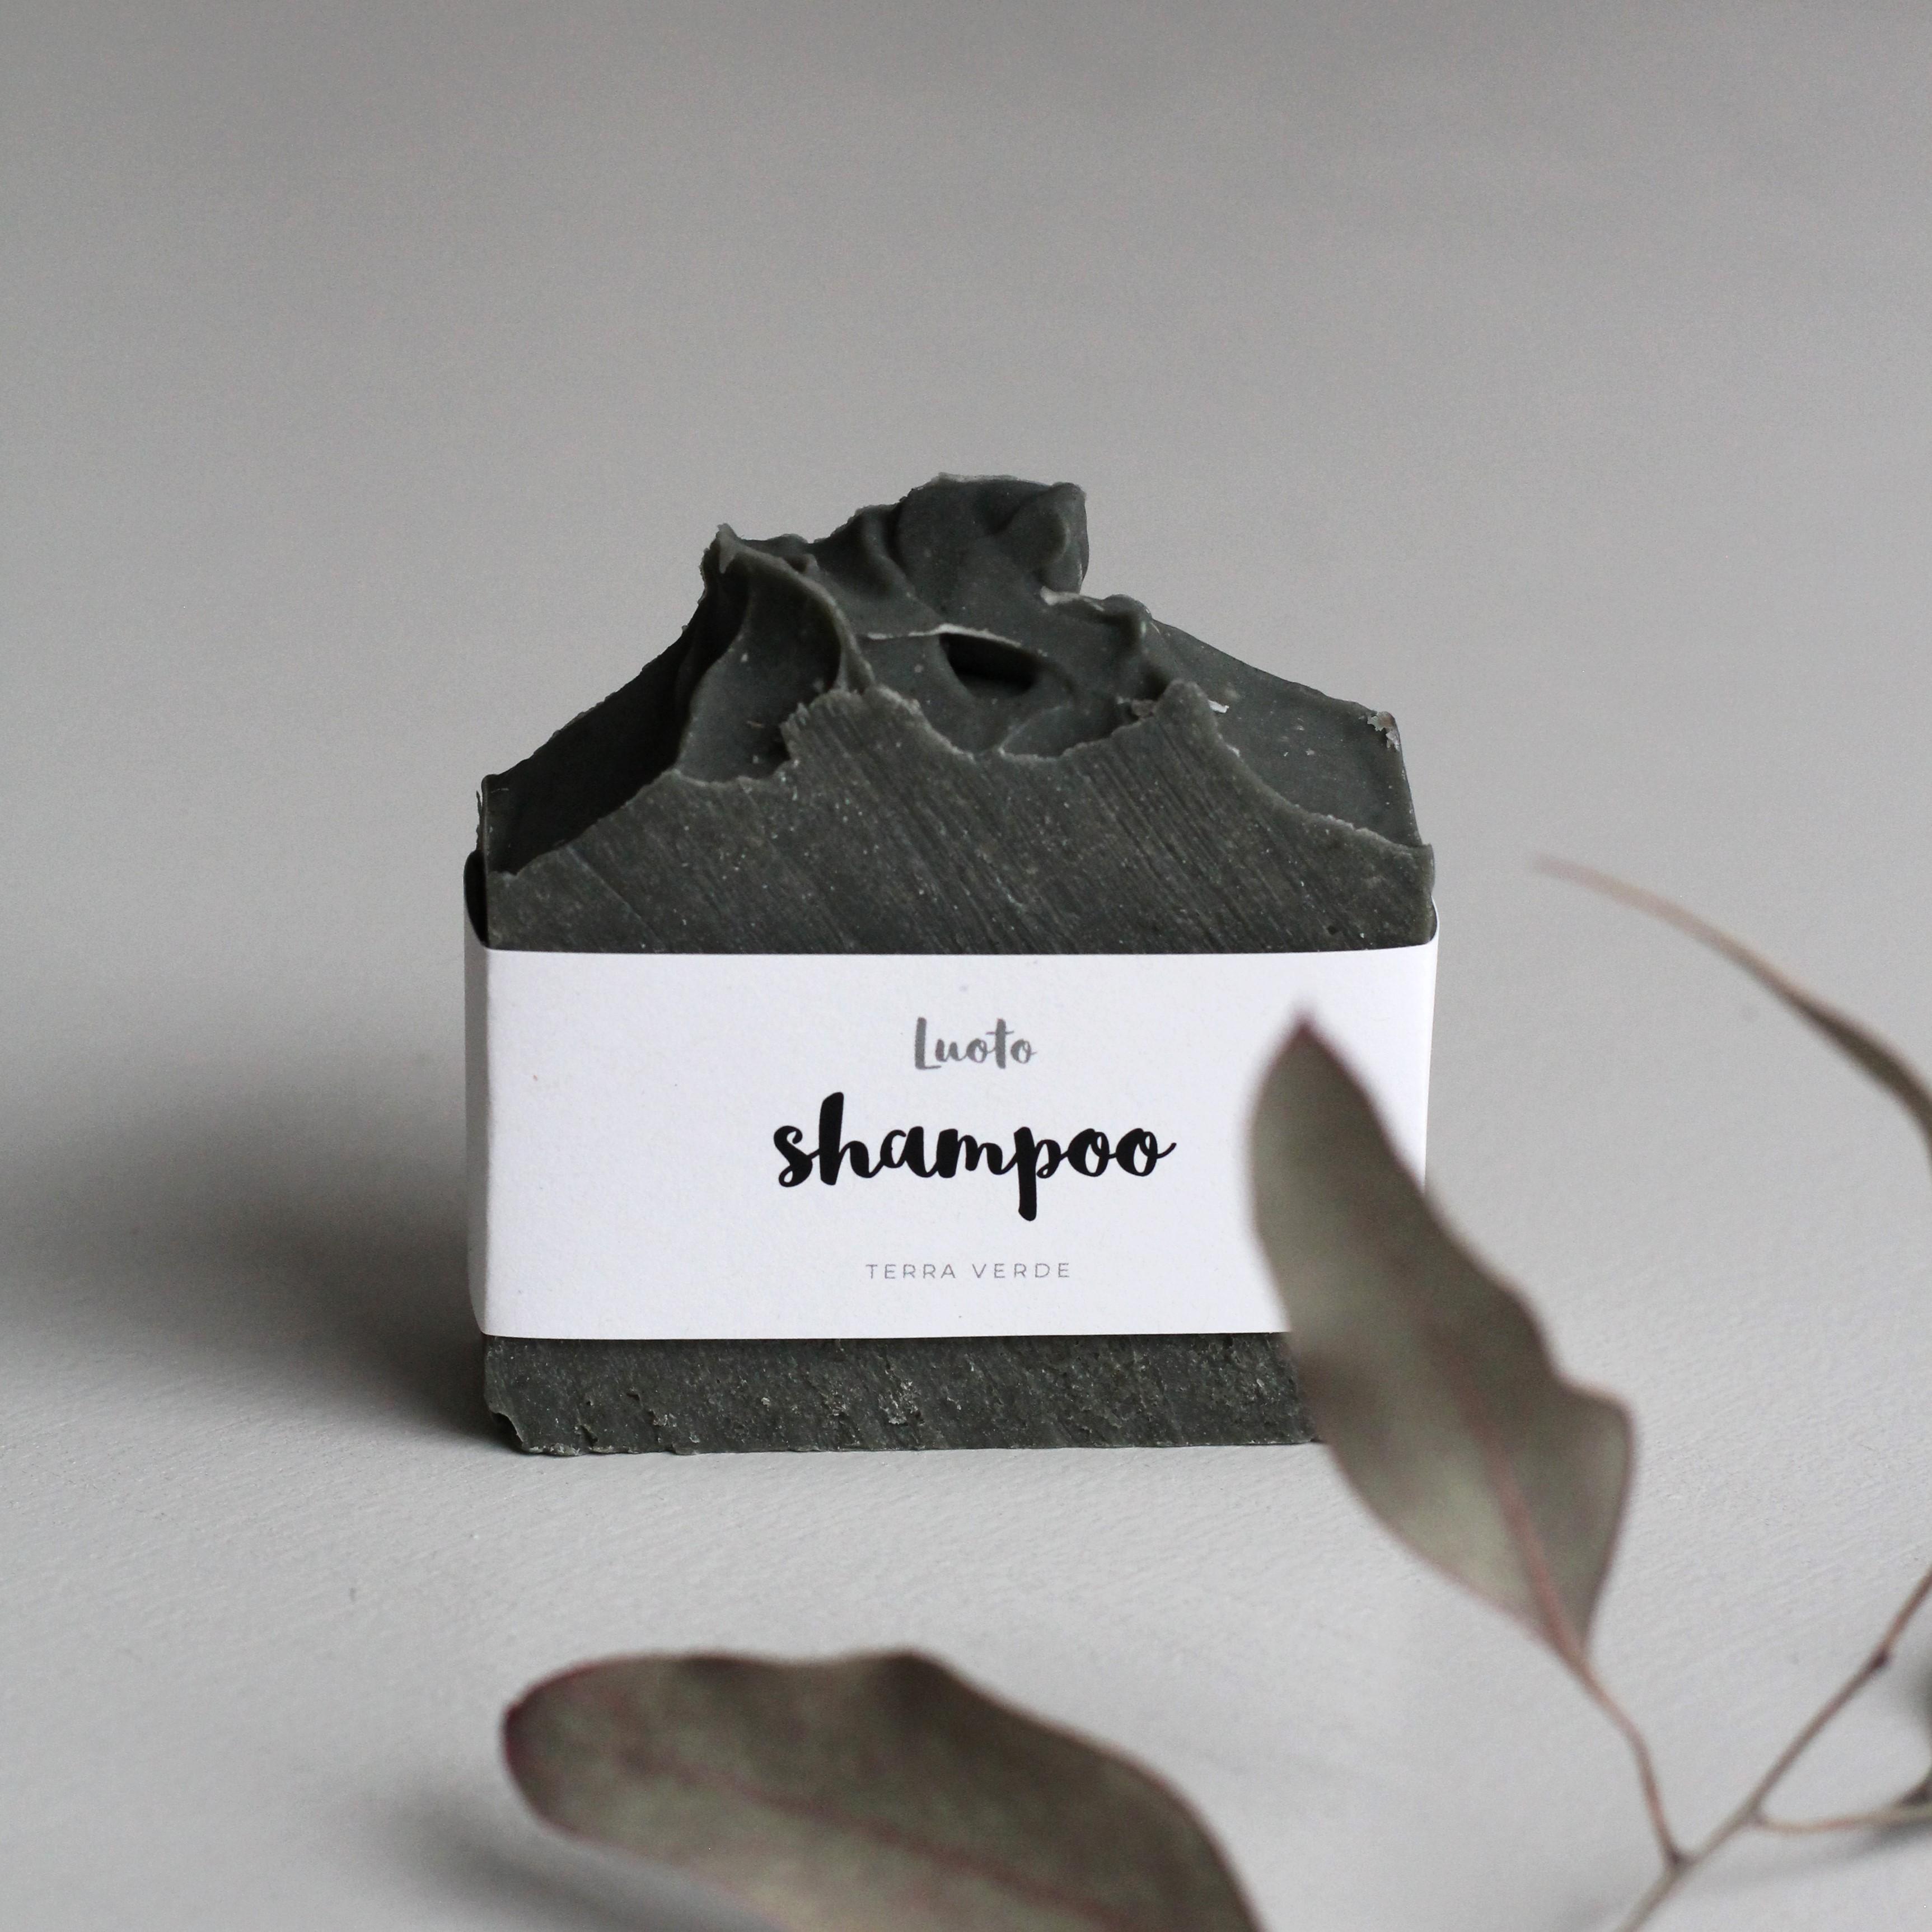 Terra Verde shampoopala - Luoto cosmetics